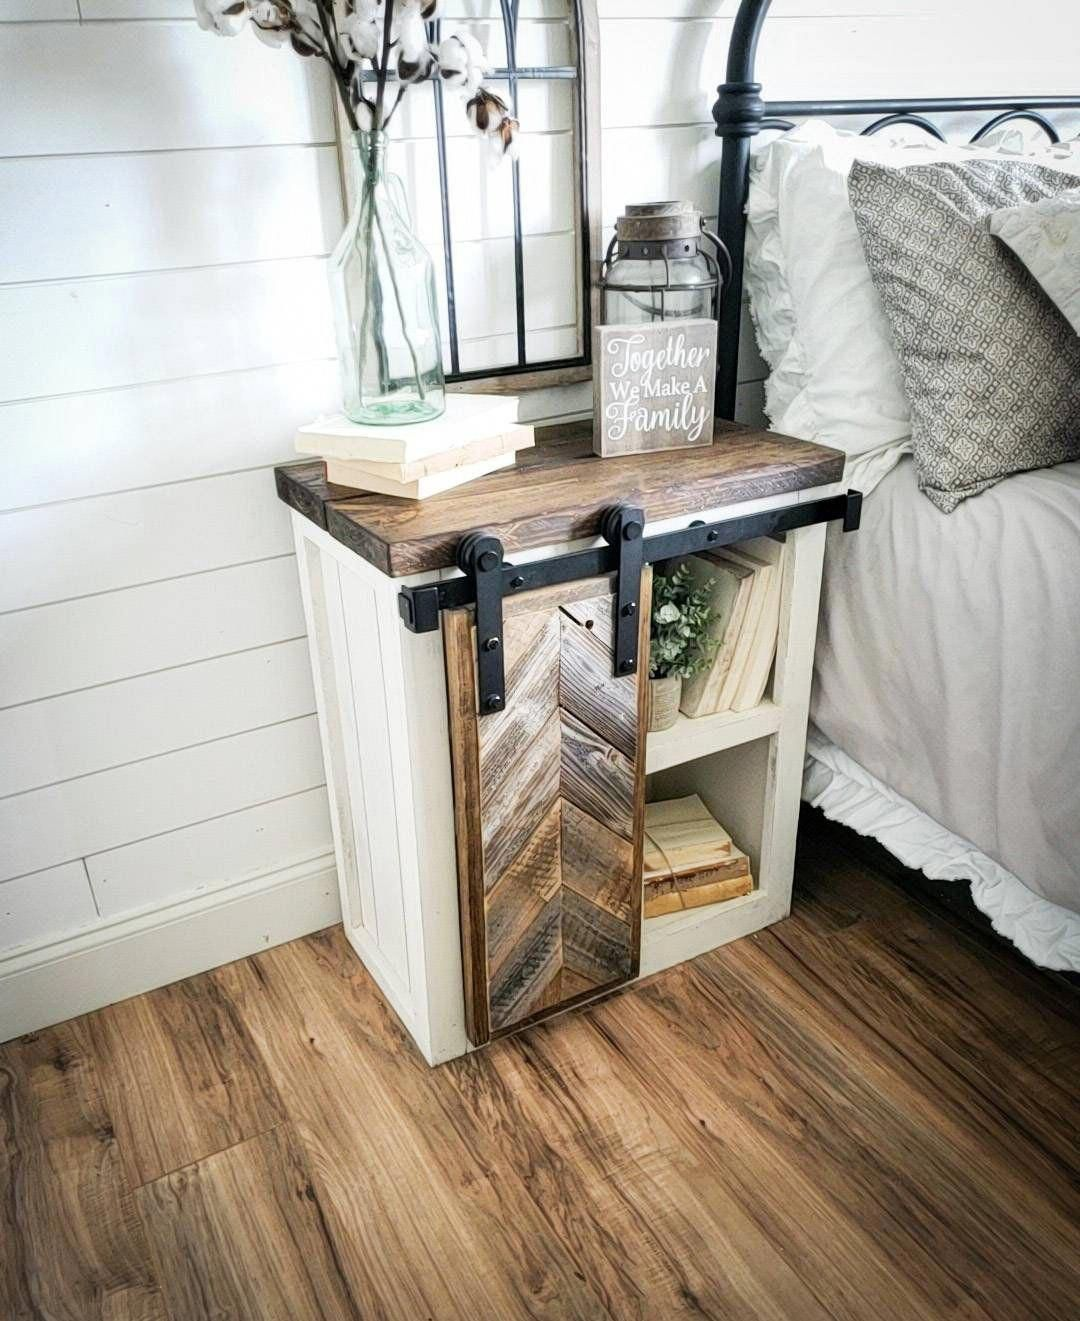 Farmhouse nightstand, rustic nightstand, custom nightstand, herringbone door nightstand, nightstands, savvyfarmhouse nightstands